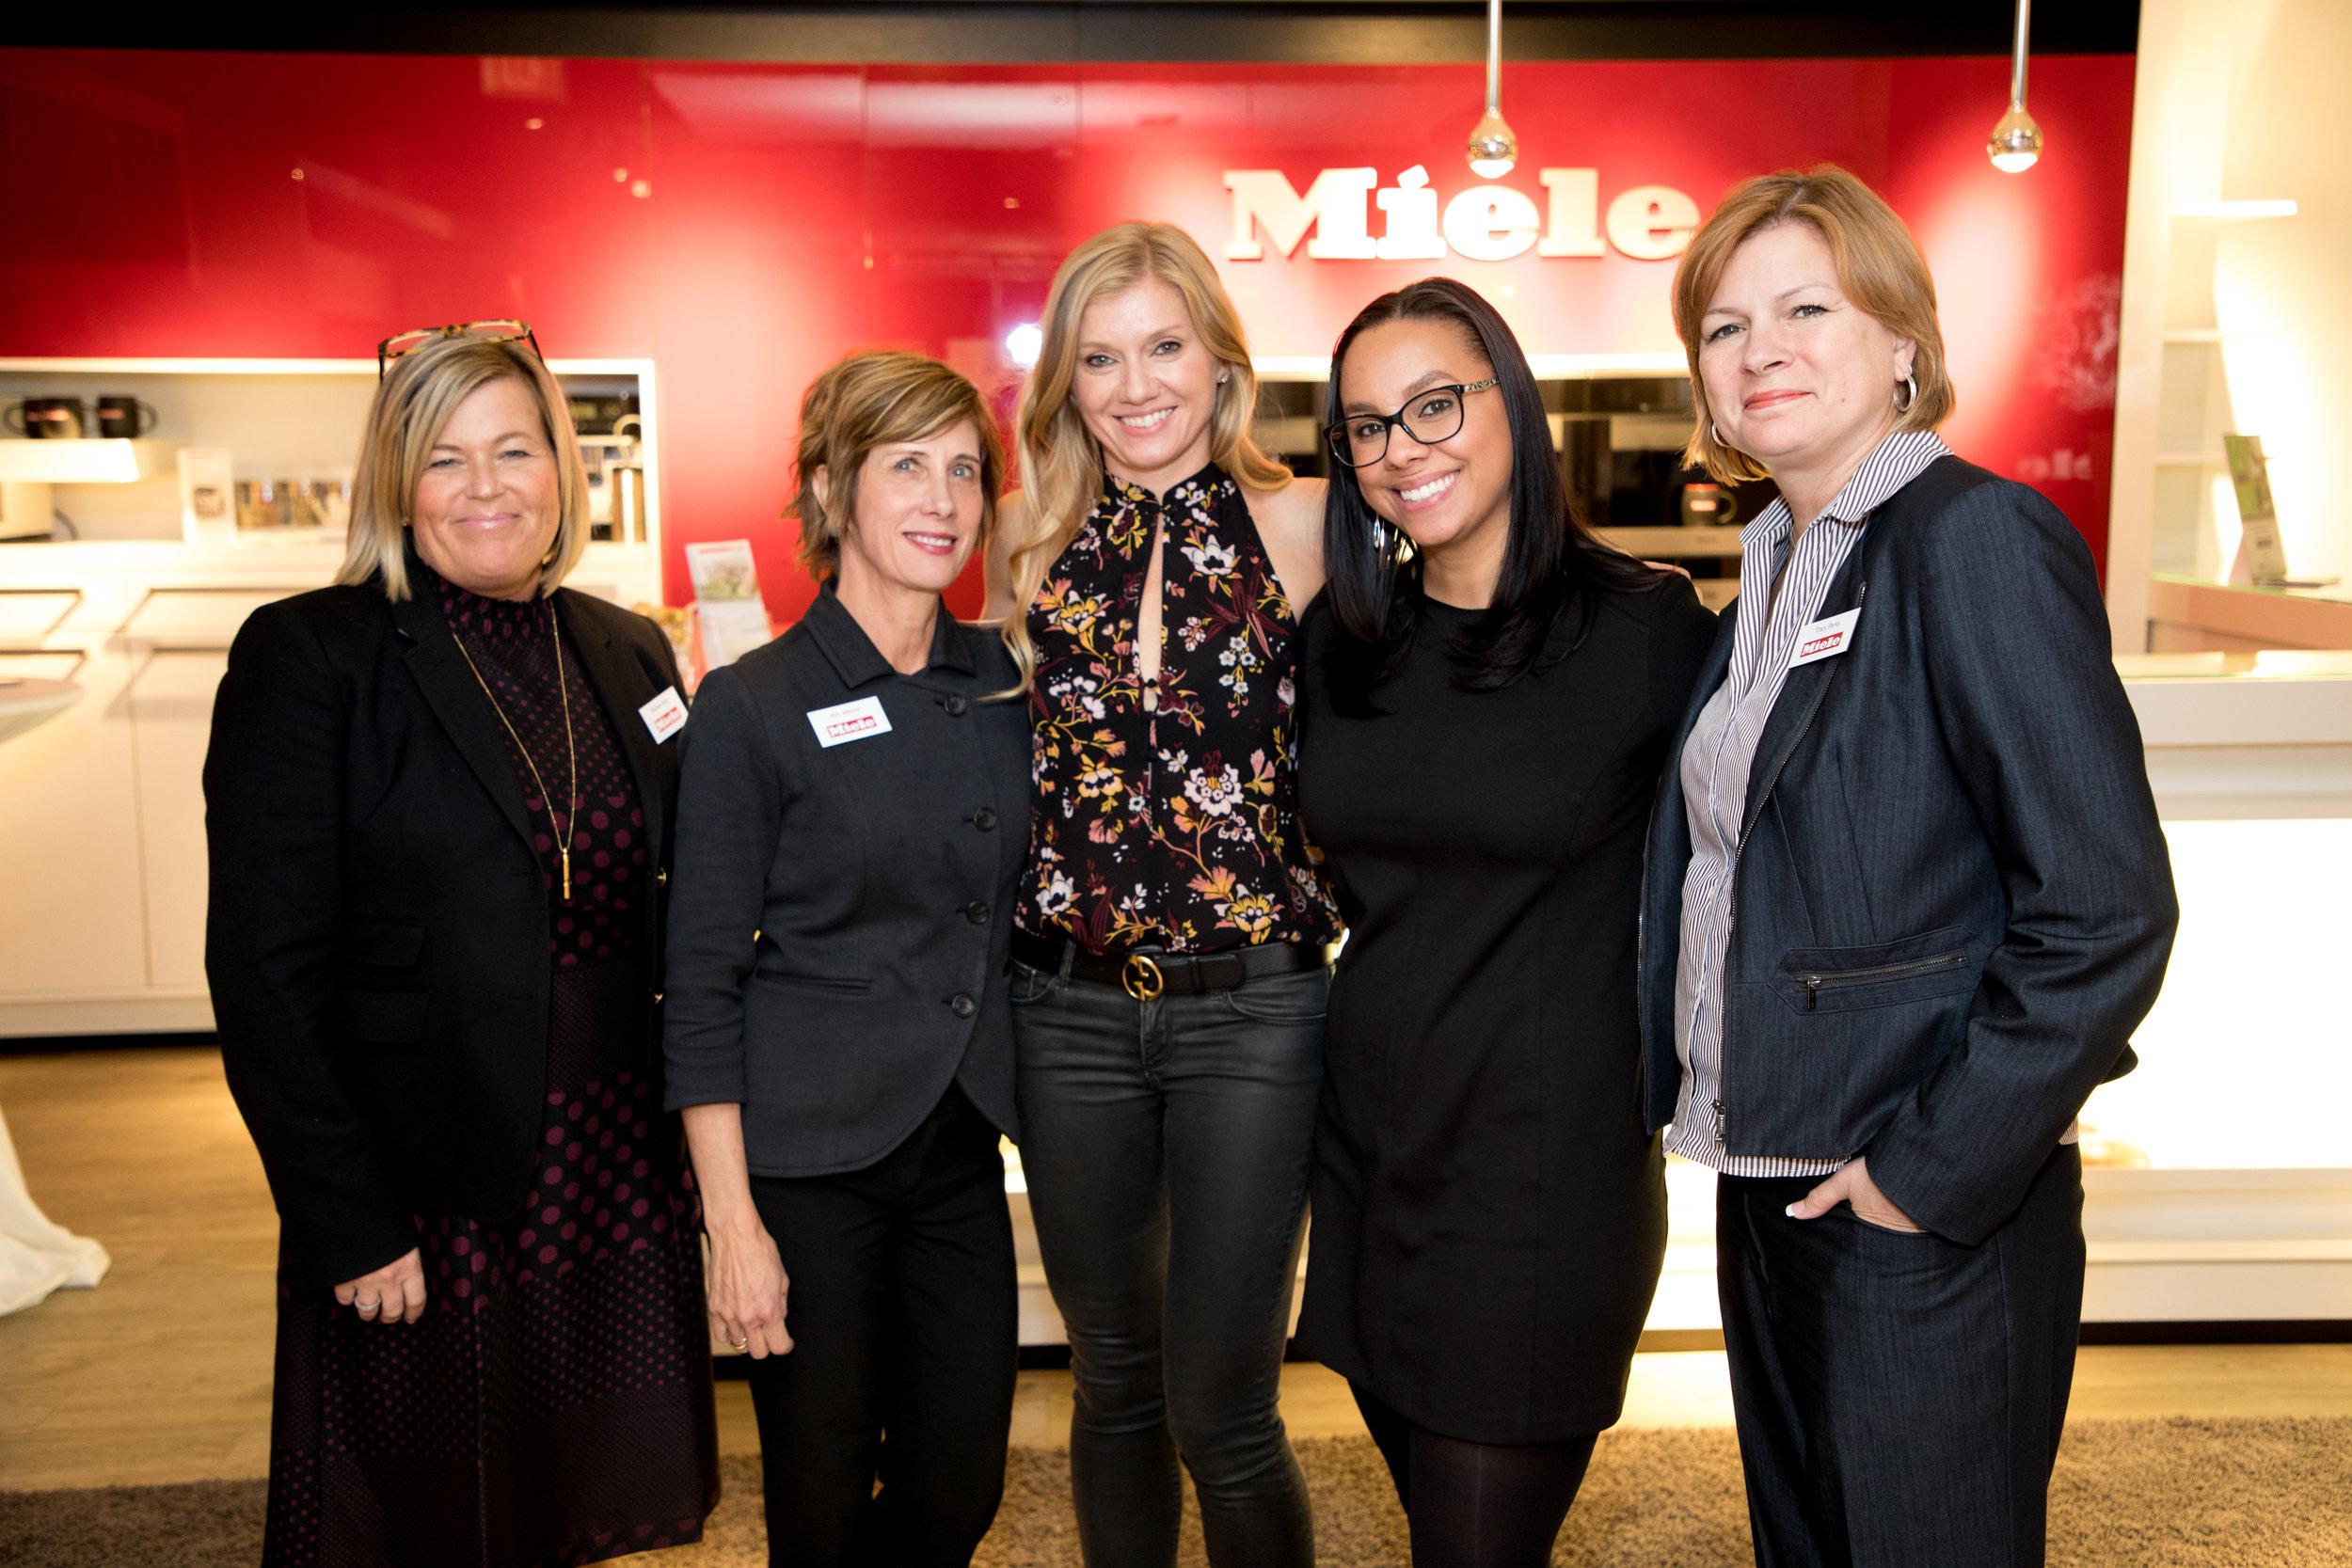 The Miele Team: Michele Ahern, Kim Alterini, Ohara Davies-Gaetano, Monique Robinson and Tracy Parks